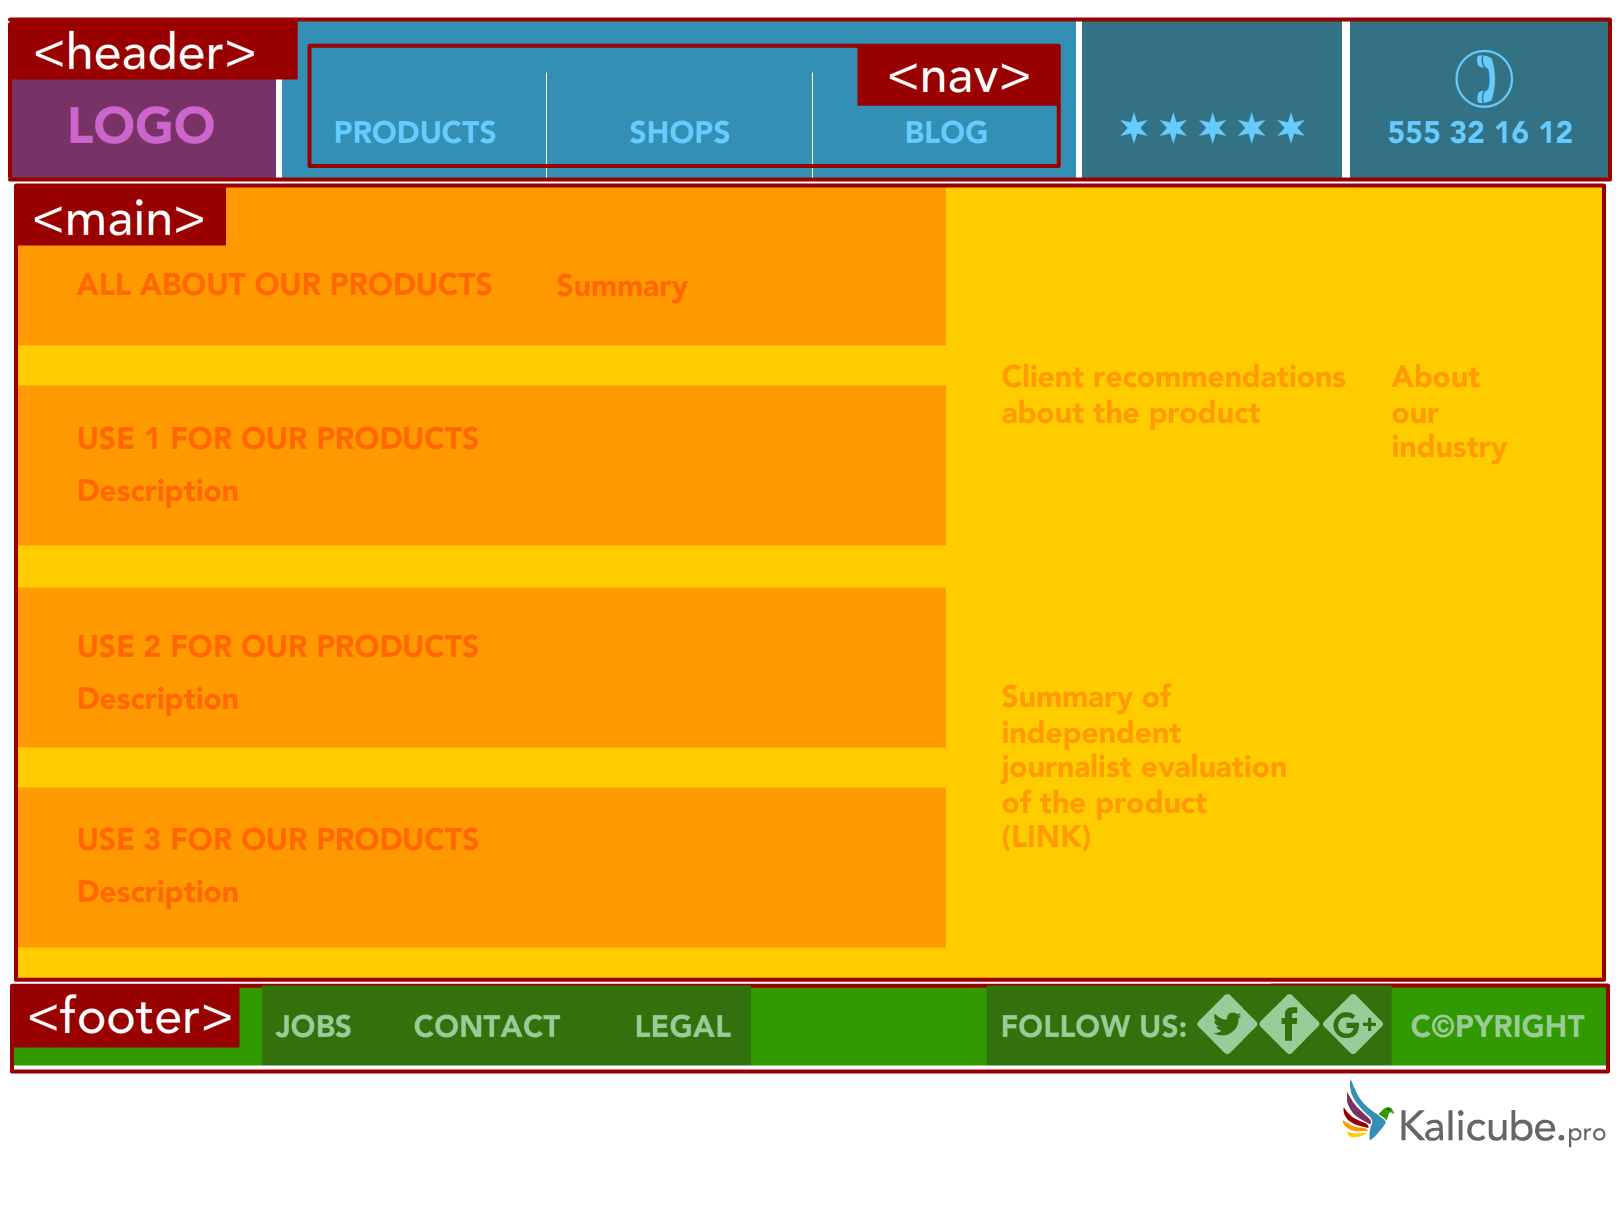 HTML5 semantic markup